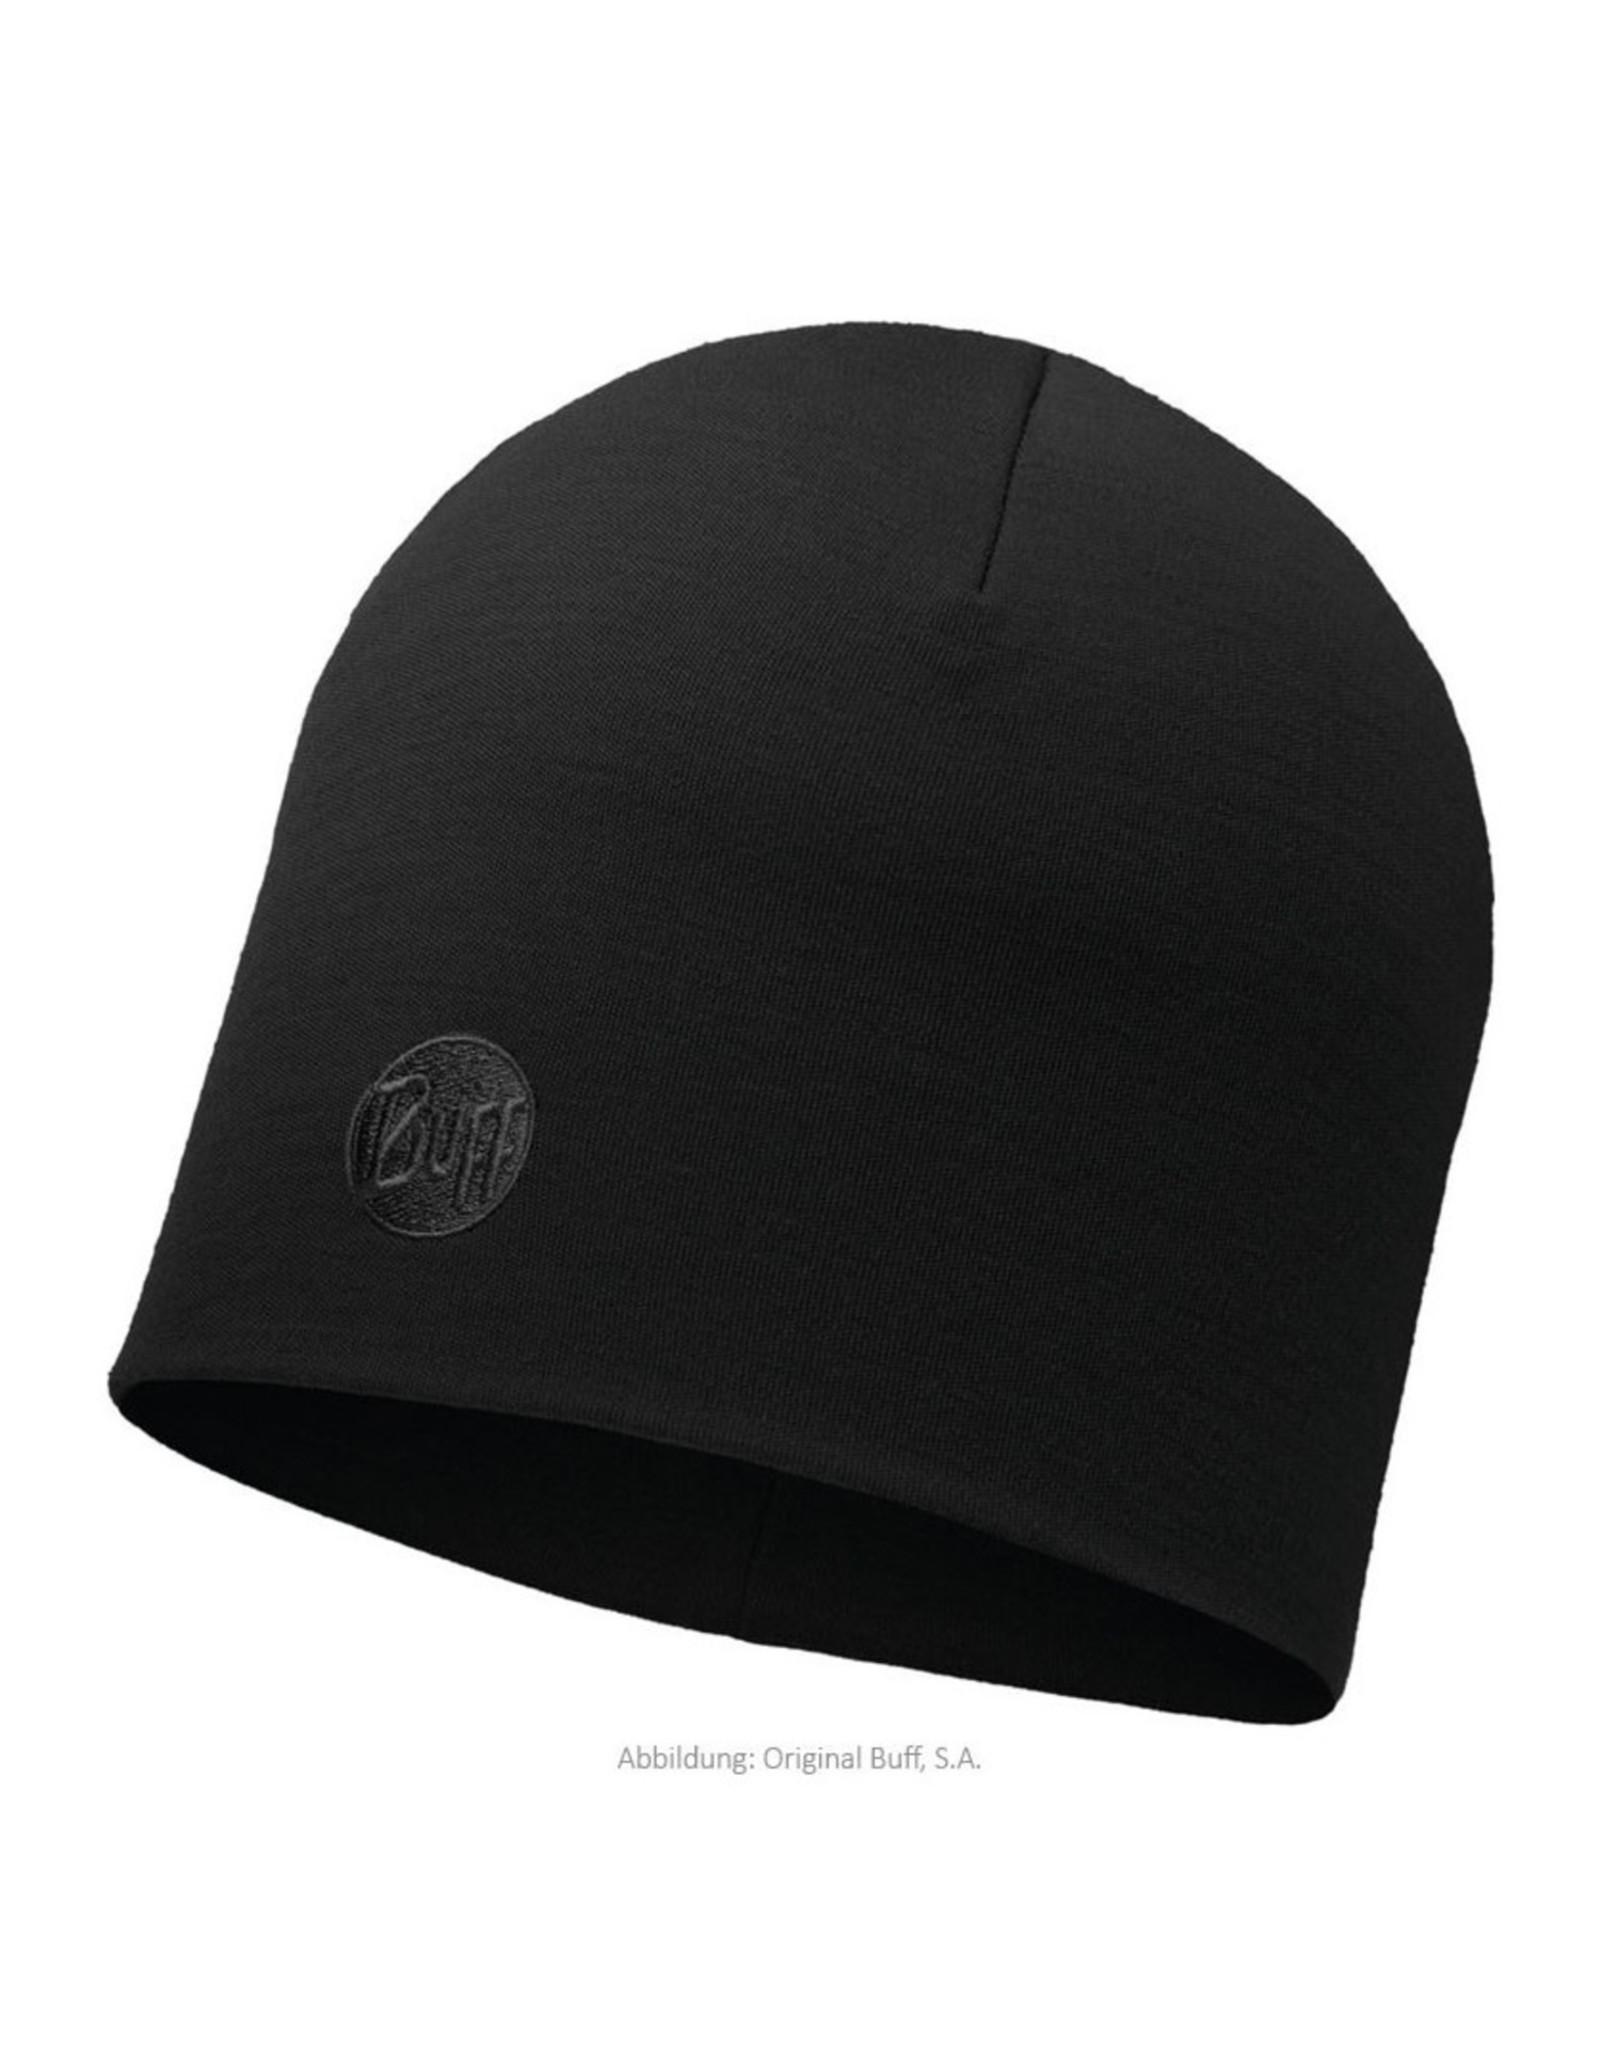 Buff Buff Heavyweight Merino Hat Solid Black